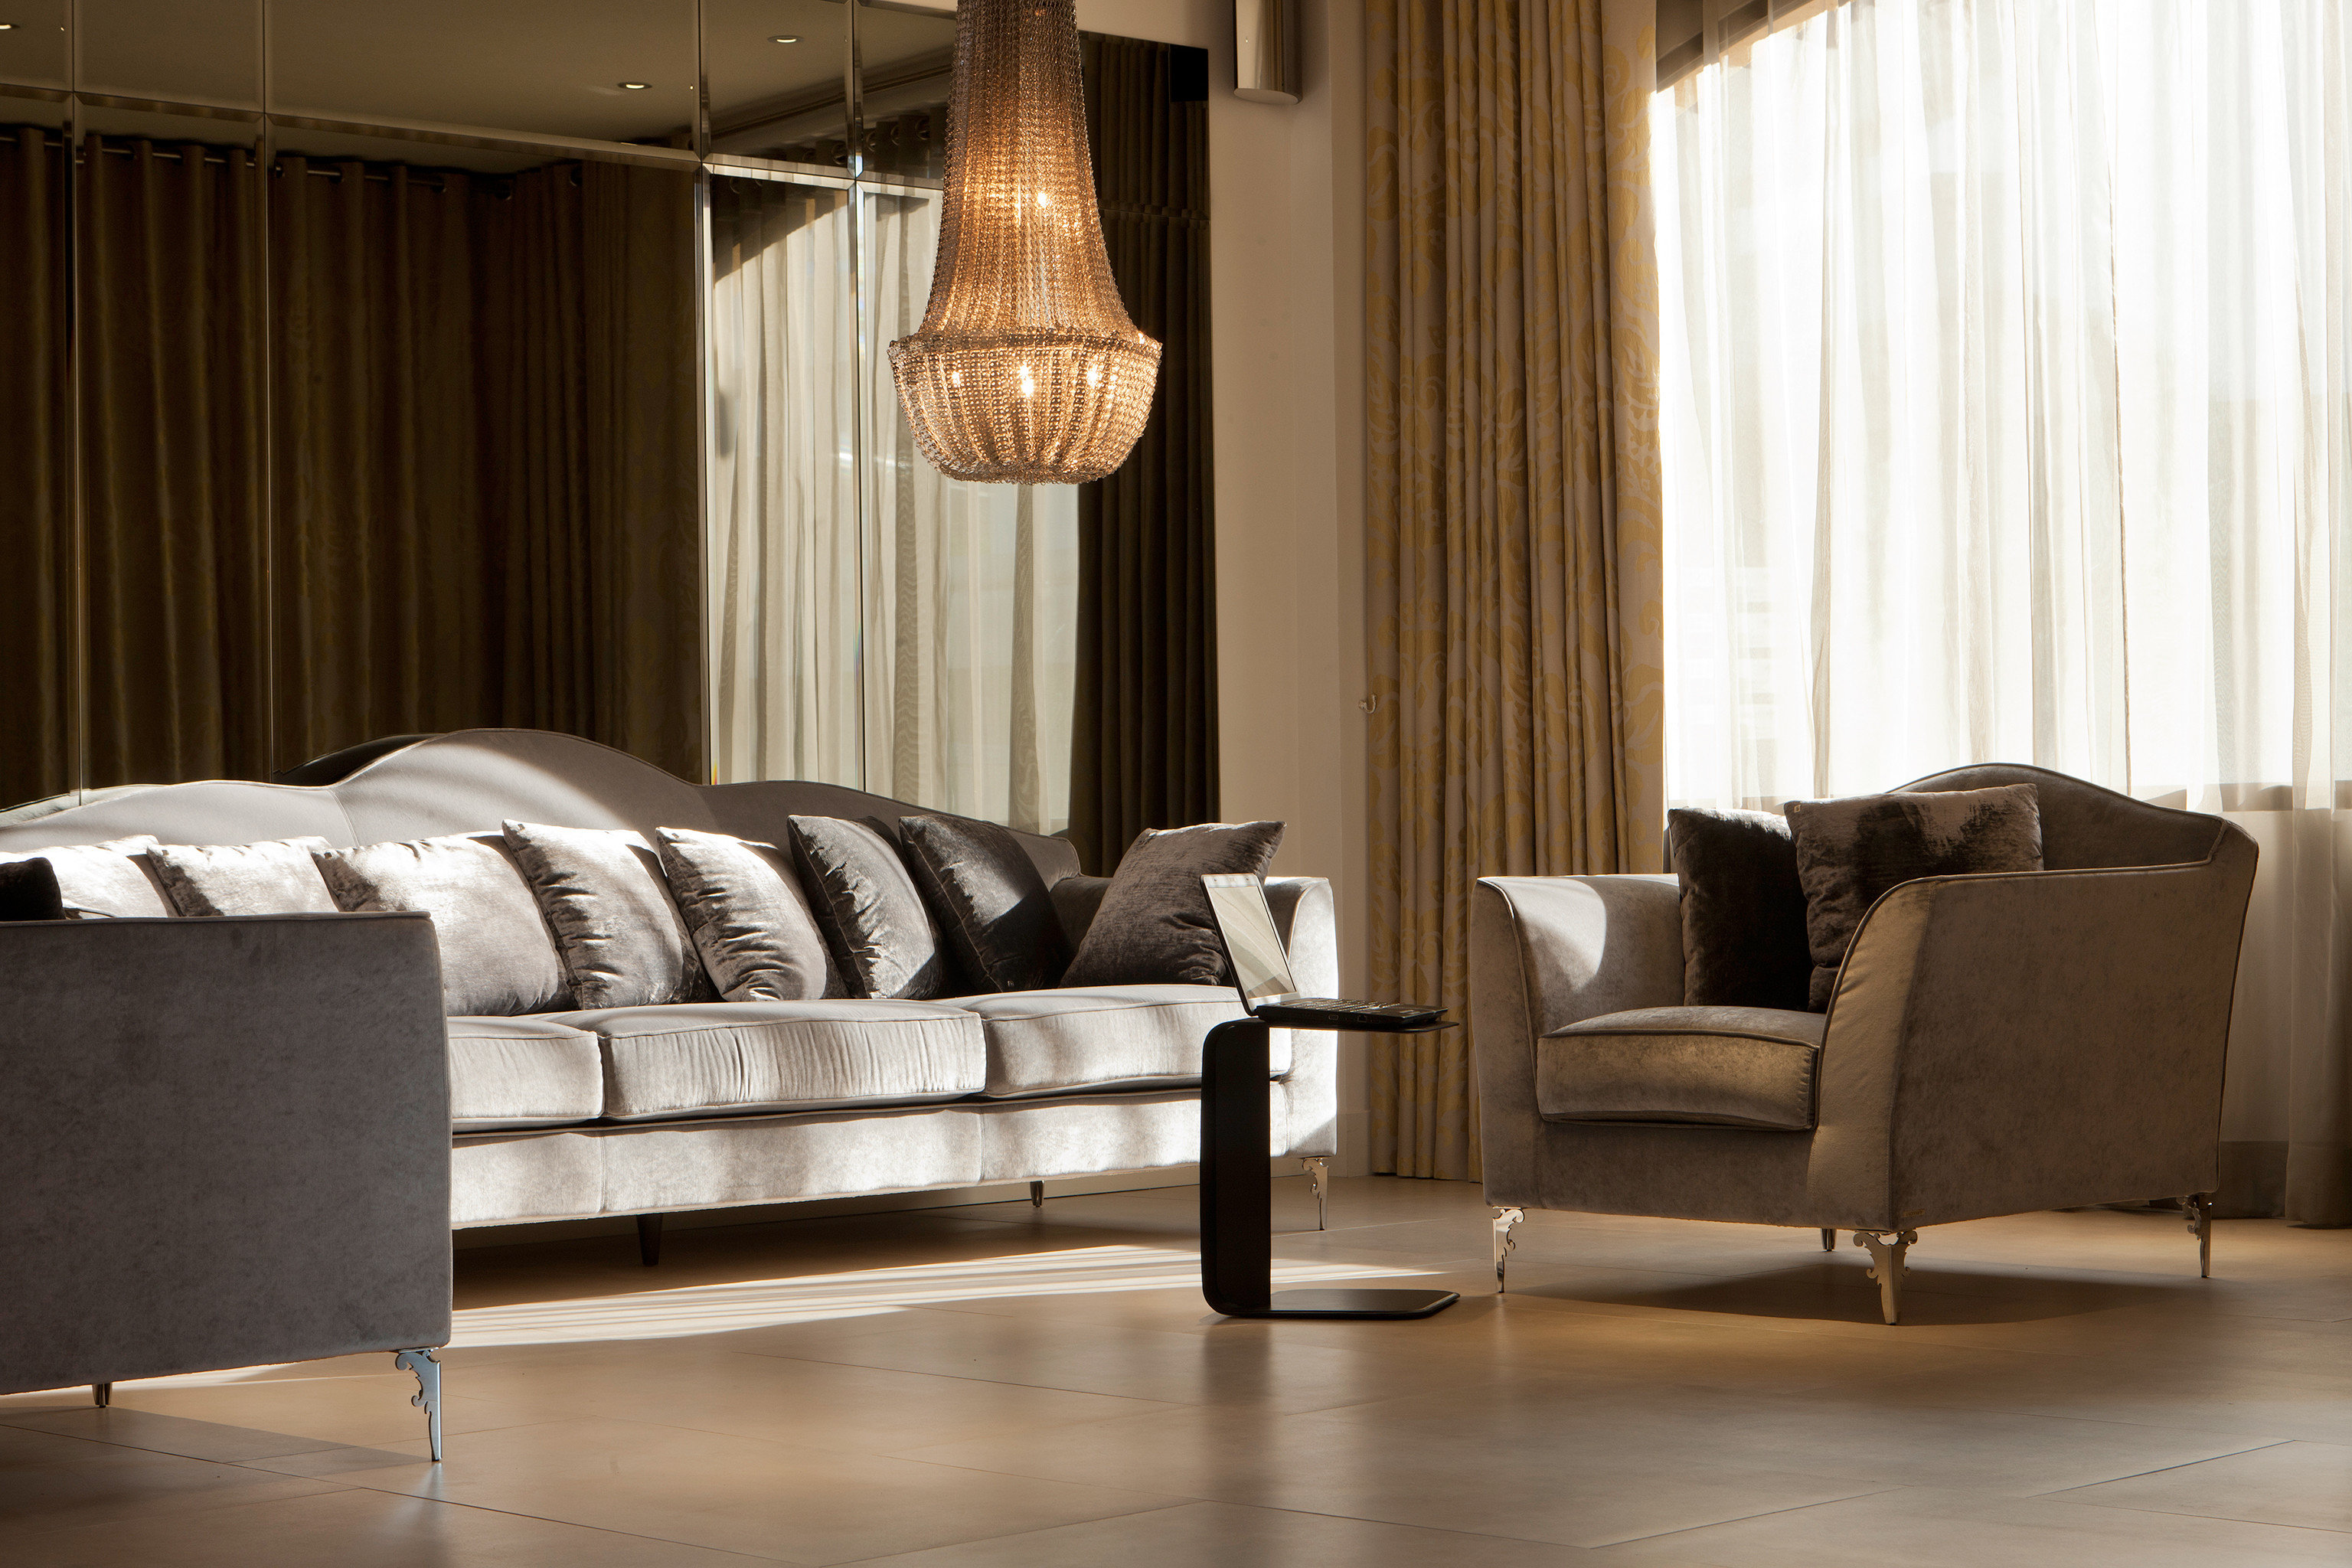 Modern Resort sofa curtain living room hardwood home wood flooring flooring window treatment